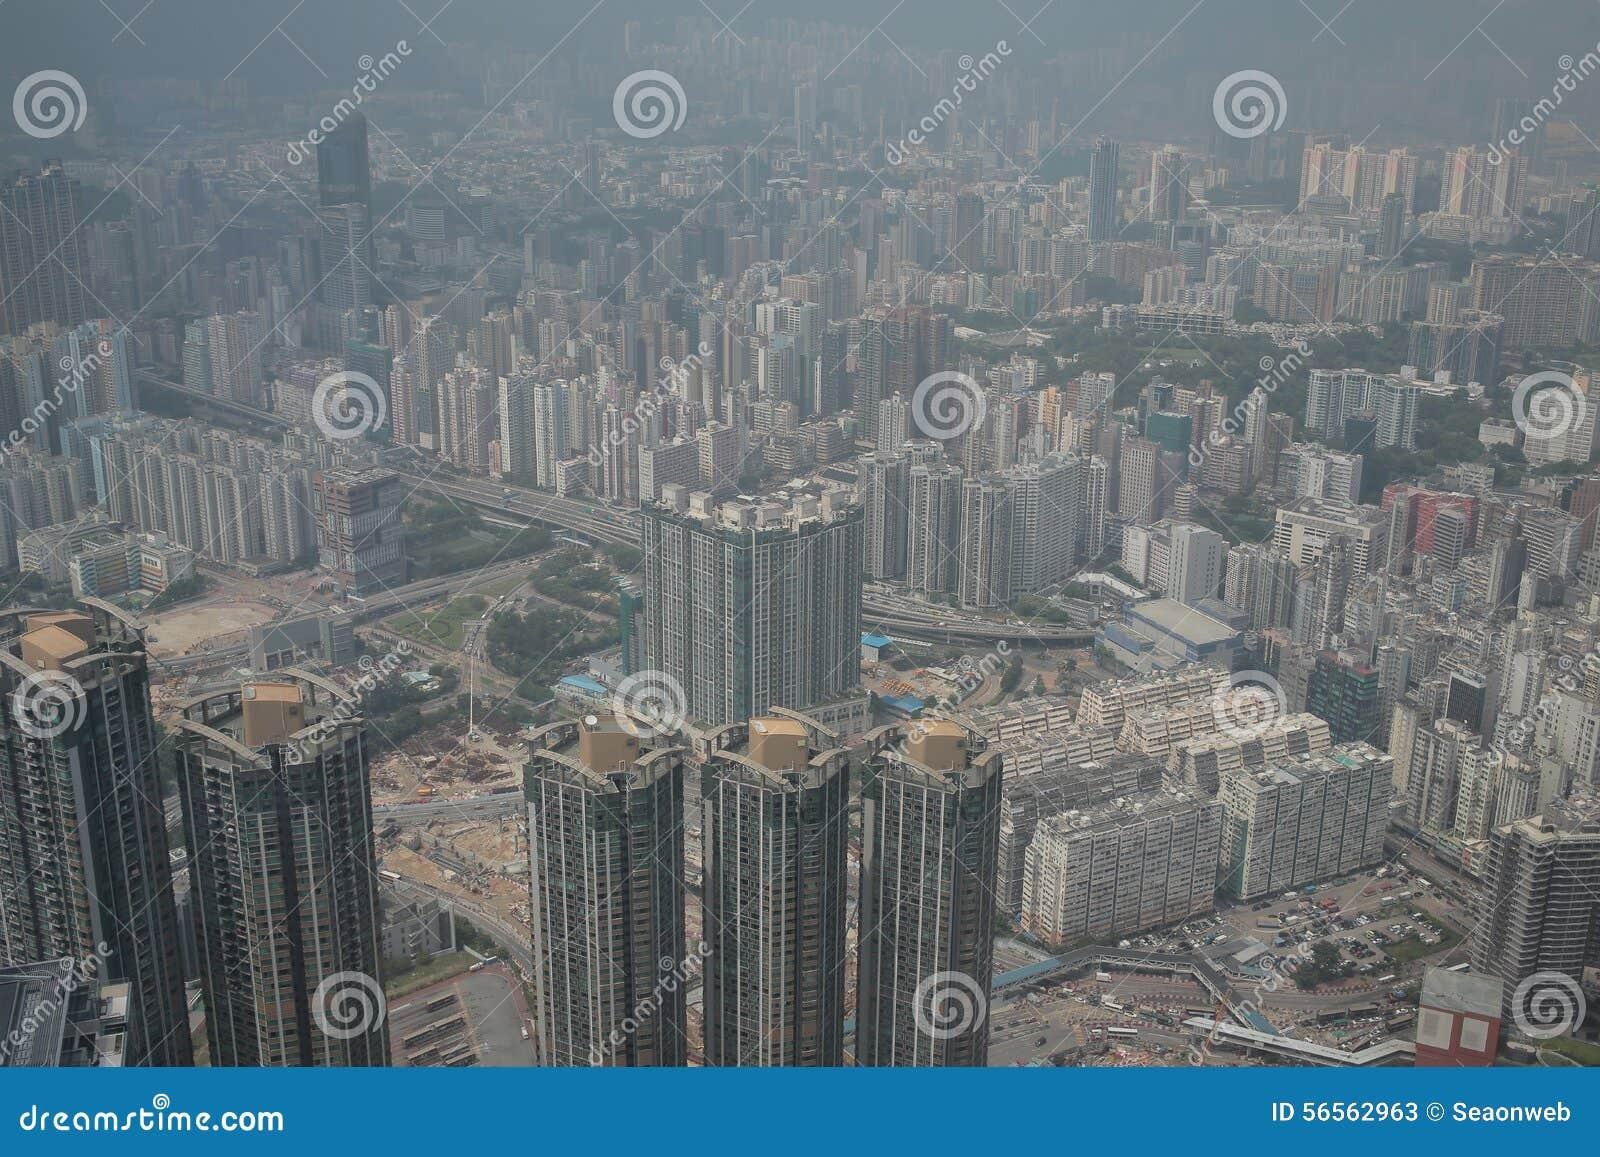 Download Άποψη Kowloon από το διεθνή κεντρικό ουρανοξύστη εμπορίου - Στοκ Εικόνα - εικόνα από τοπίο, περιοχή: 56562963